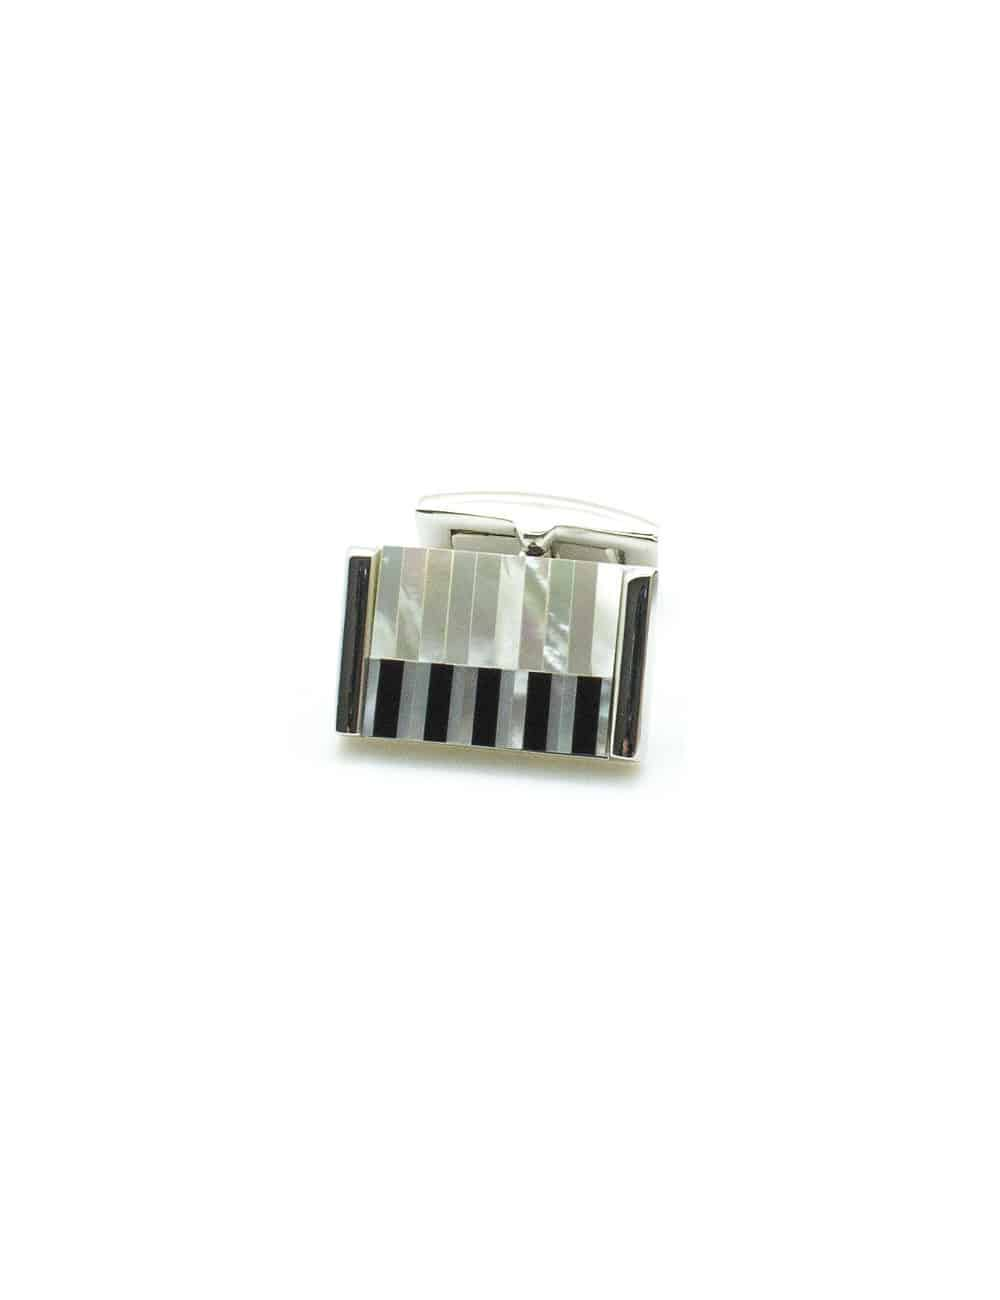 White Pearl Piano with Black Enamel Keys Cufflink C212NH-013